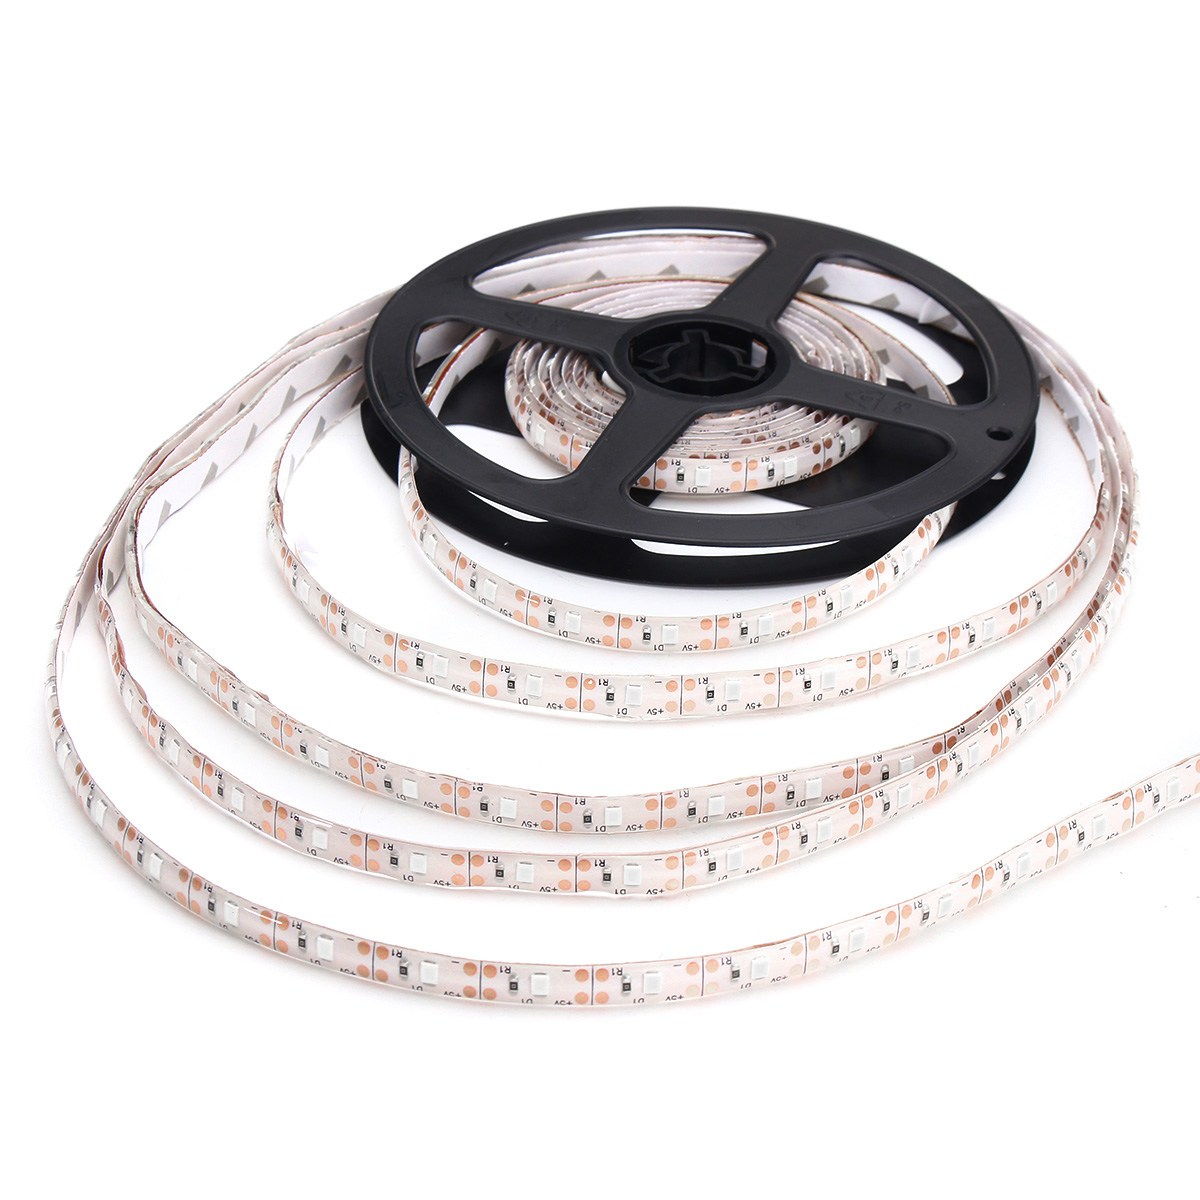 Led Lighting Strips For Home: Smuxi USB LED Strip 2835 LED Lights 12V Flexible Home